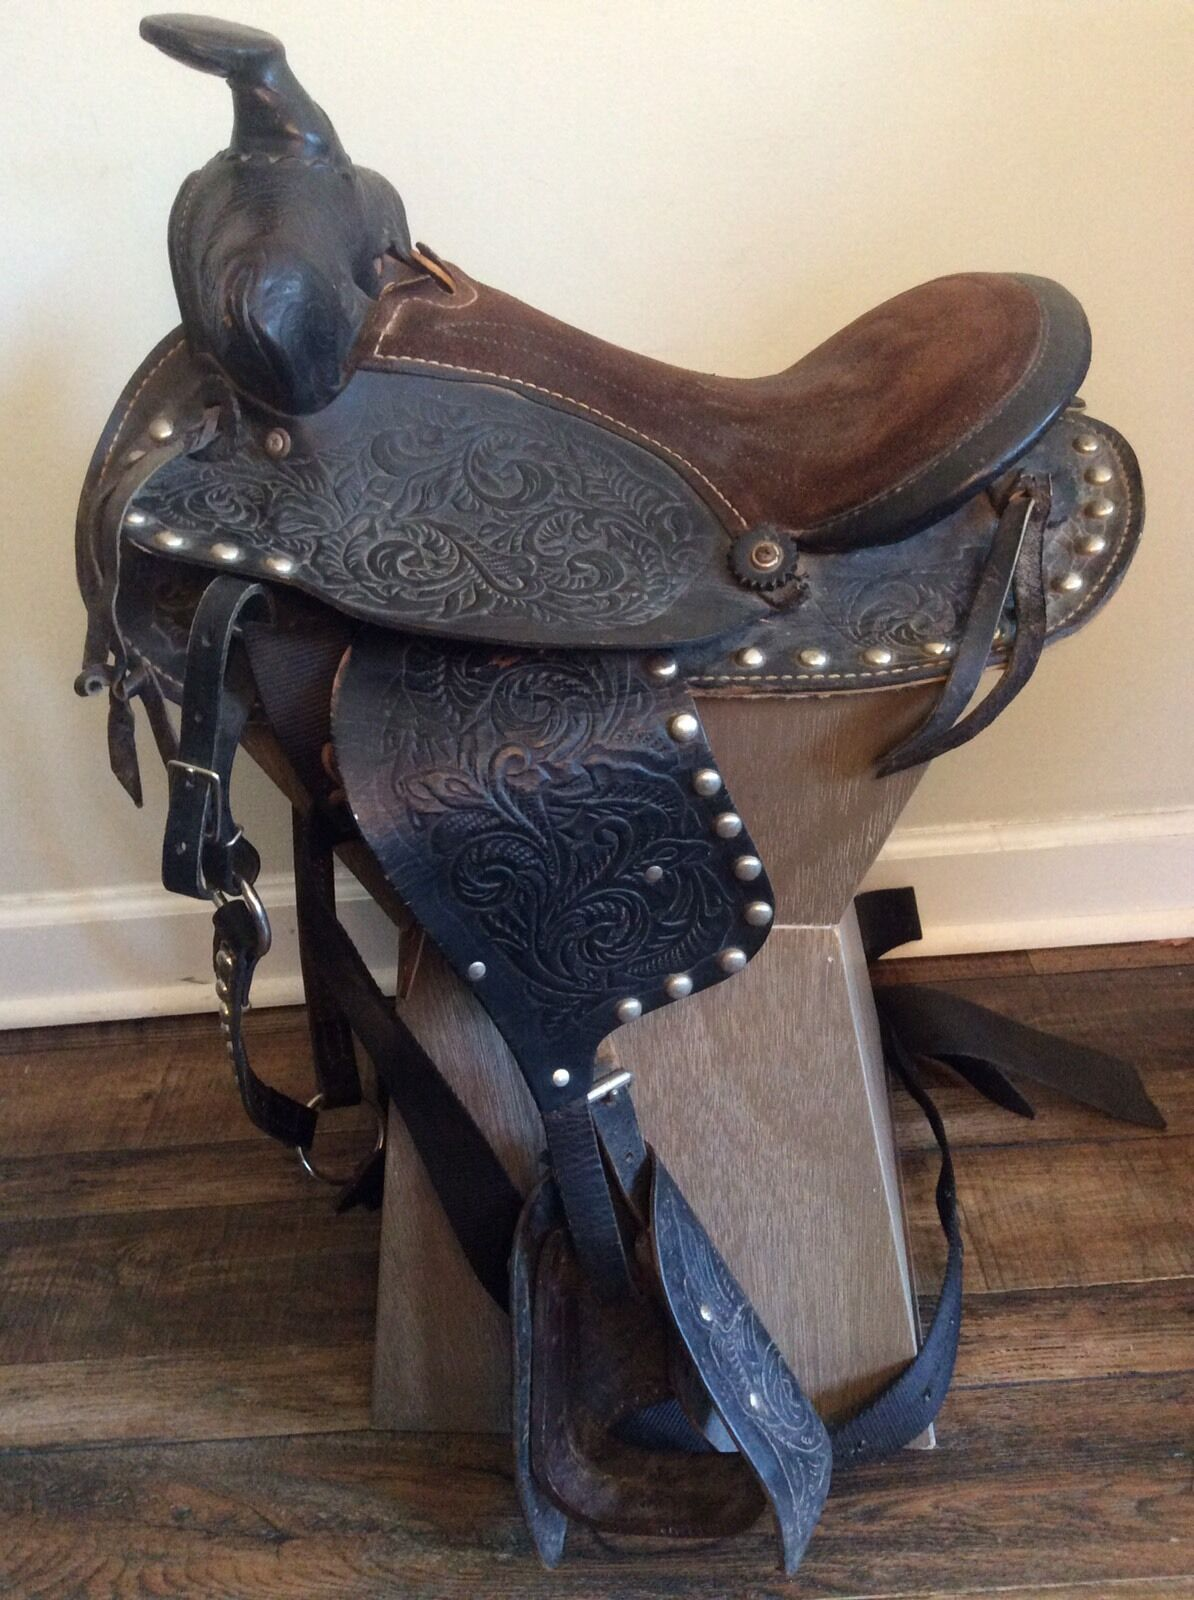 12.5 Inch Western Barrel Racing Horse Saddle